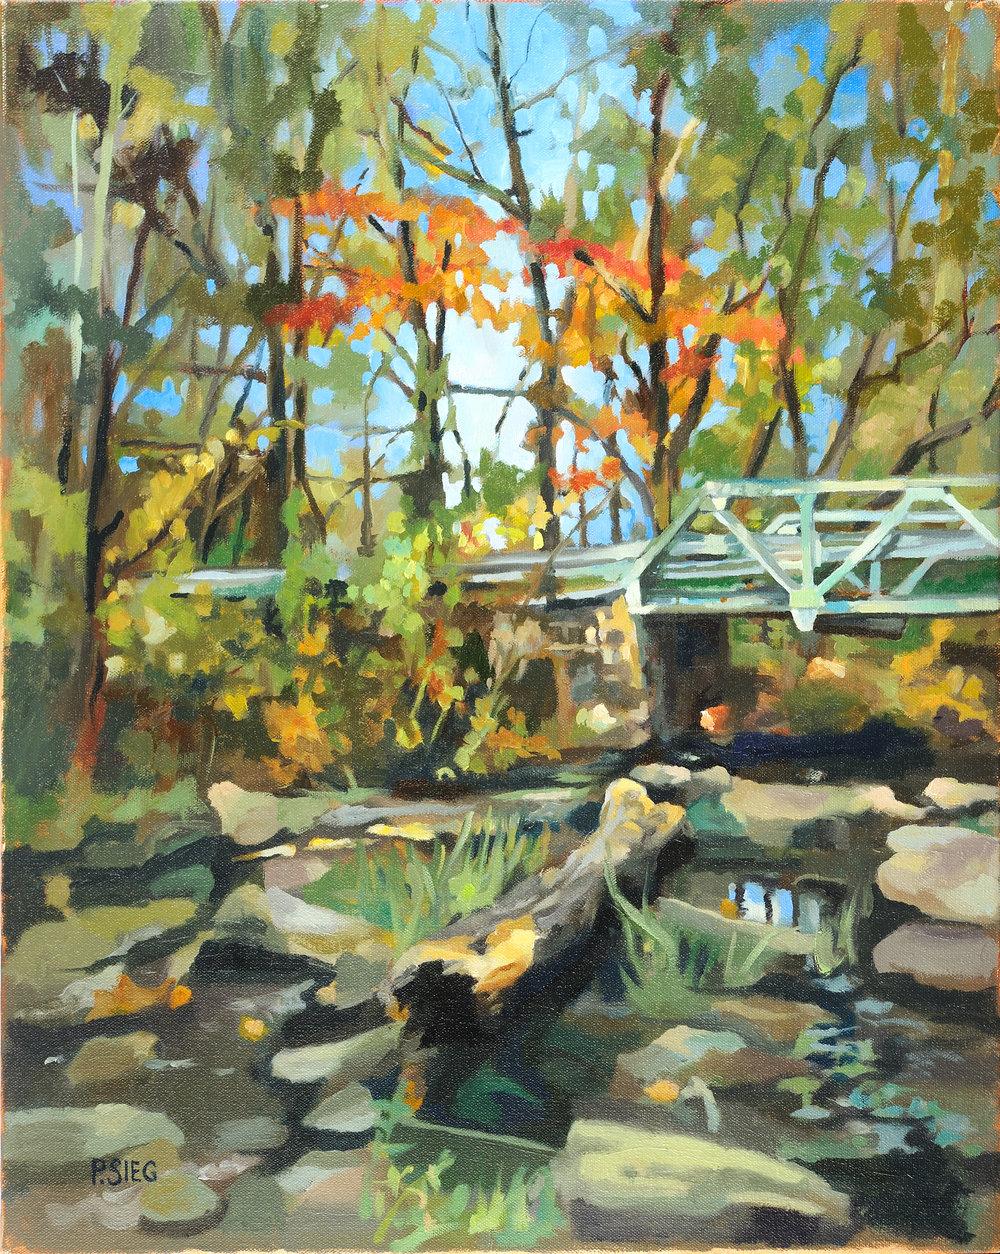 "Montevideo Bridge  16"" x 20"", oil on canvas For sale,  contact the artist   Honorable mention, December, 2016, Rockville Art League member show"